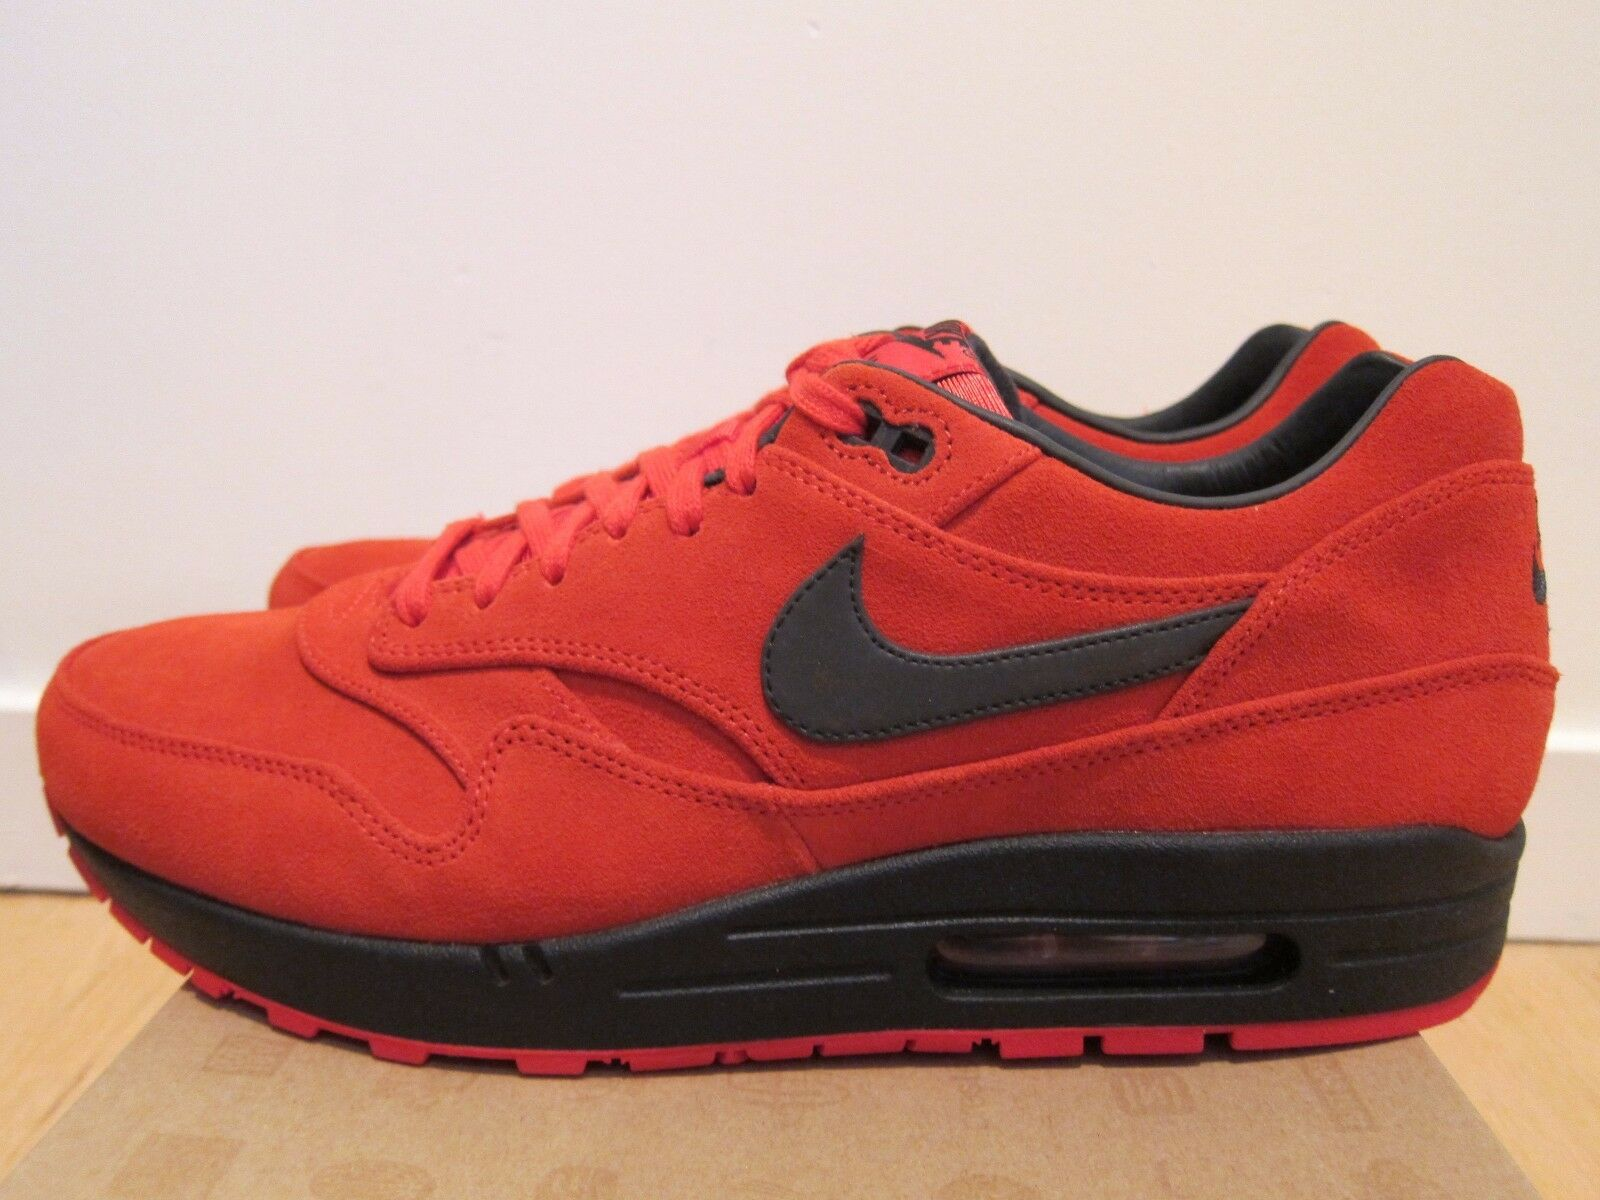 2012 Nike Air Max 1 PRM Premium Pimento Red Black 3M sizes 10 11.5 13 14